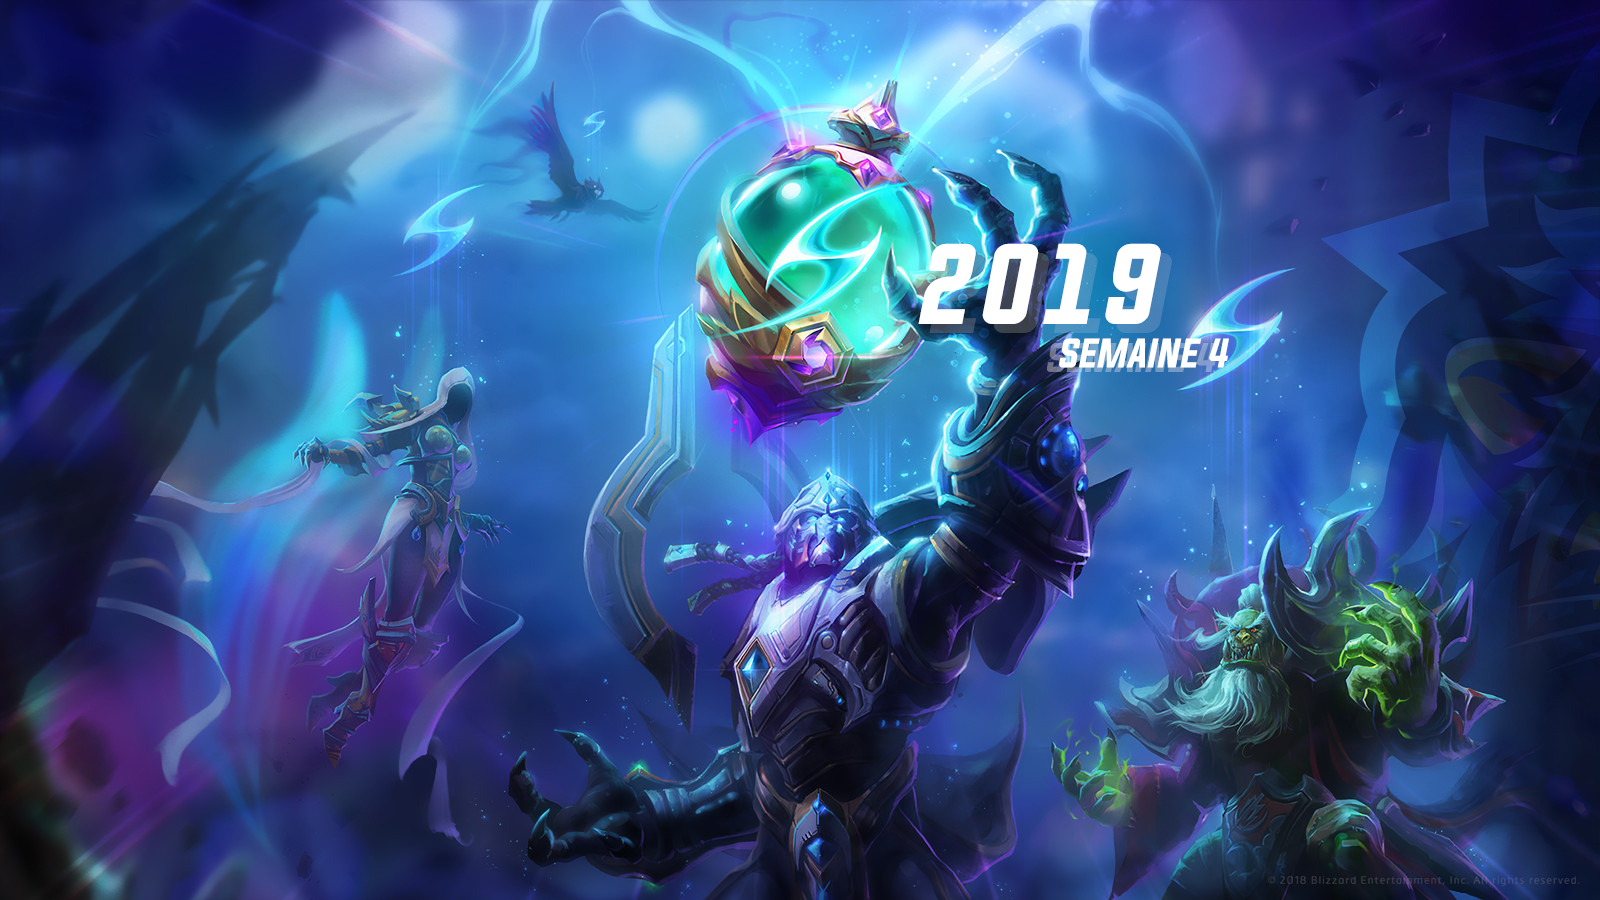 Janvier 2019 : Semaine 4